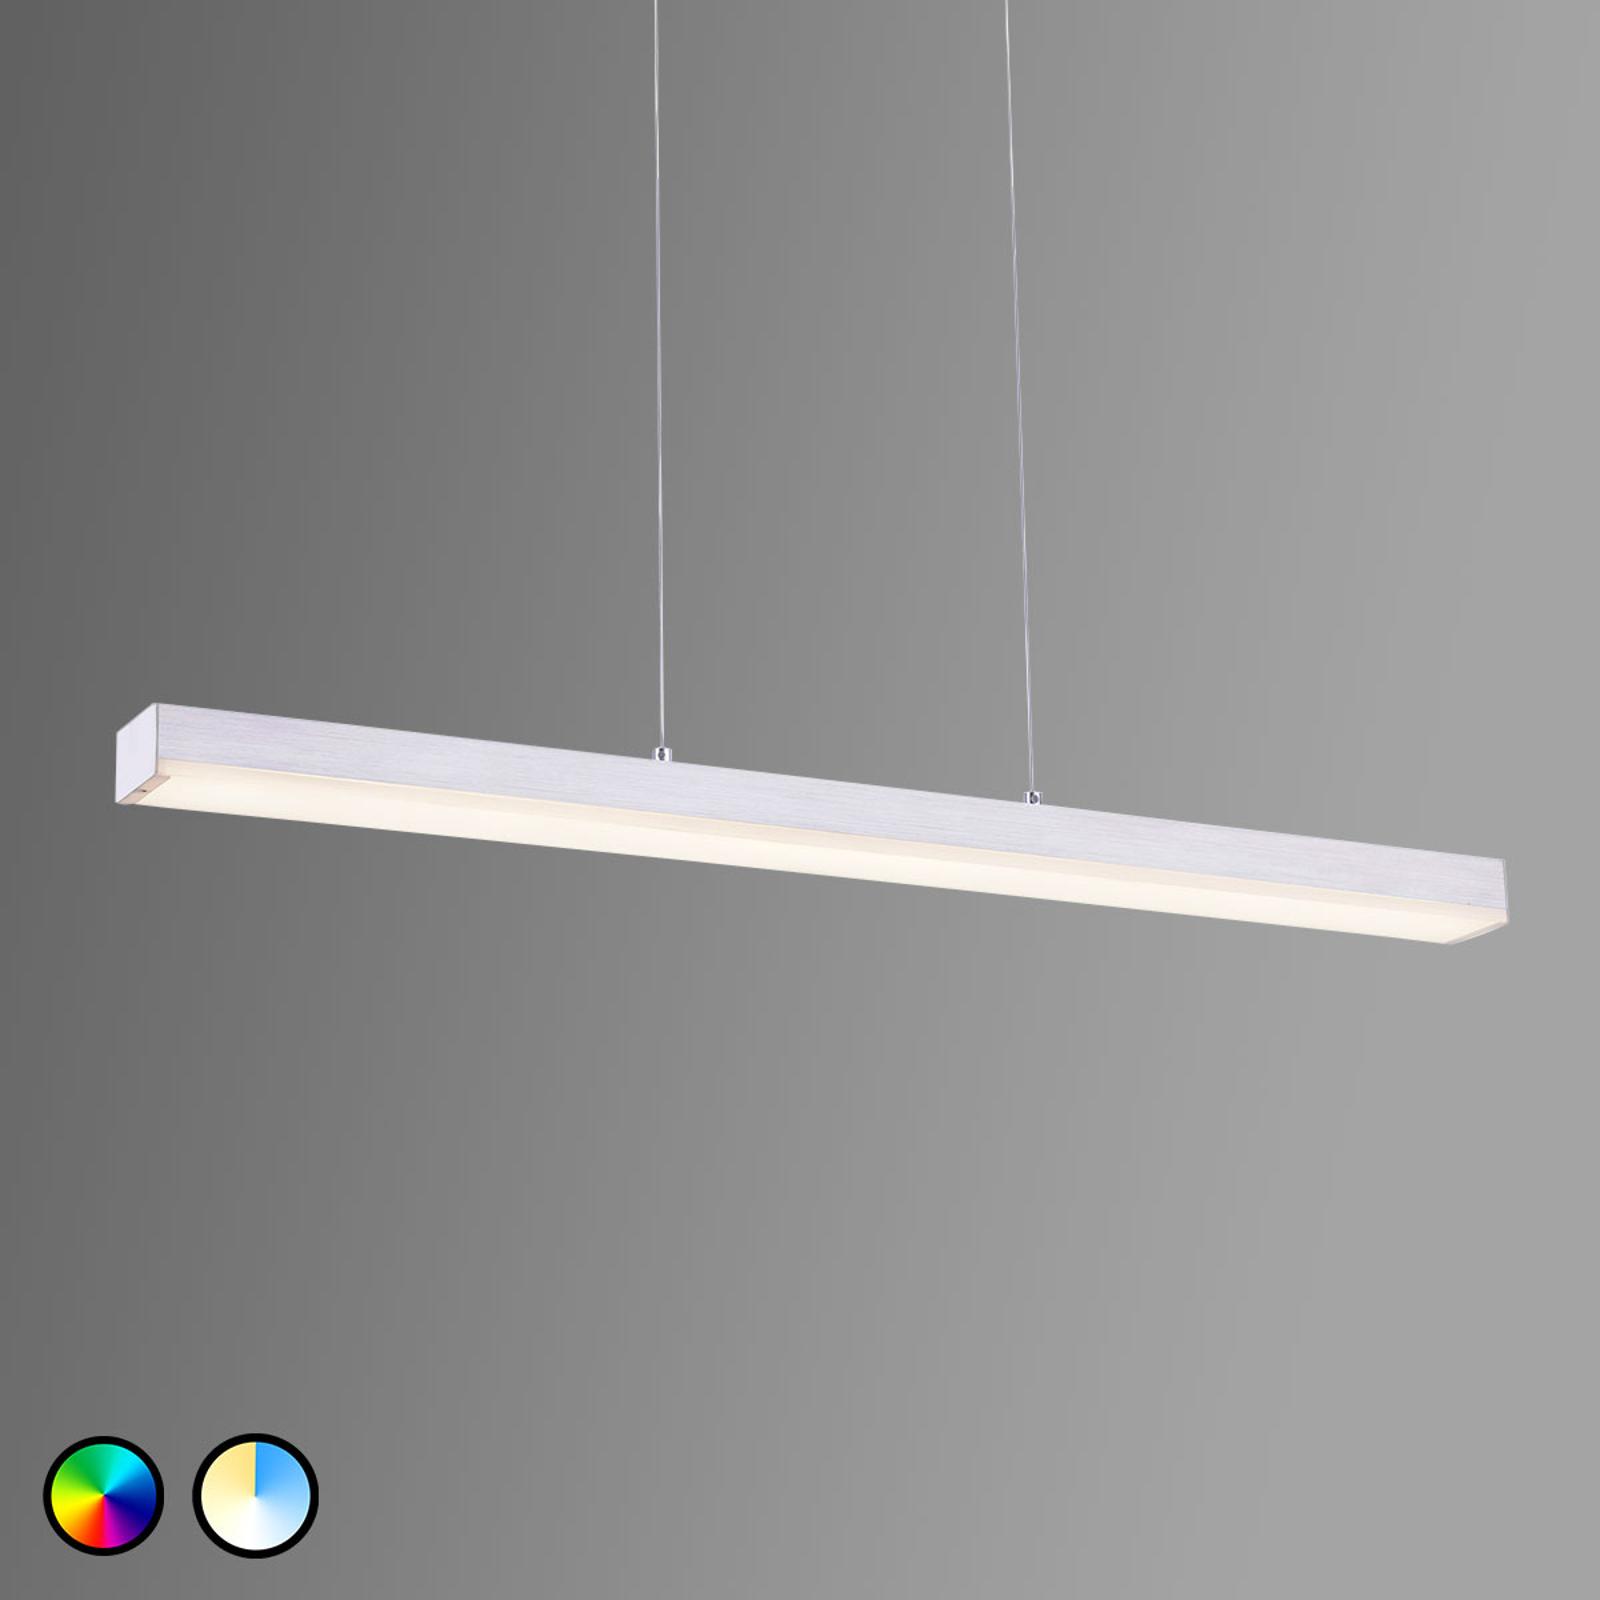 Trio WiZ Livaro LED-Pendelleuchte nickel matt